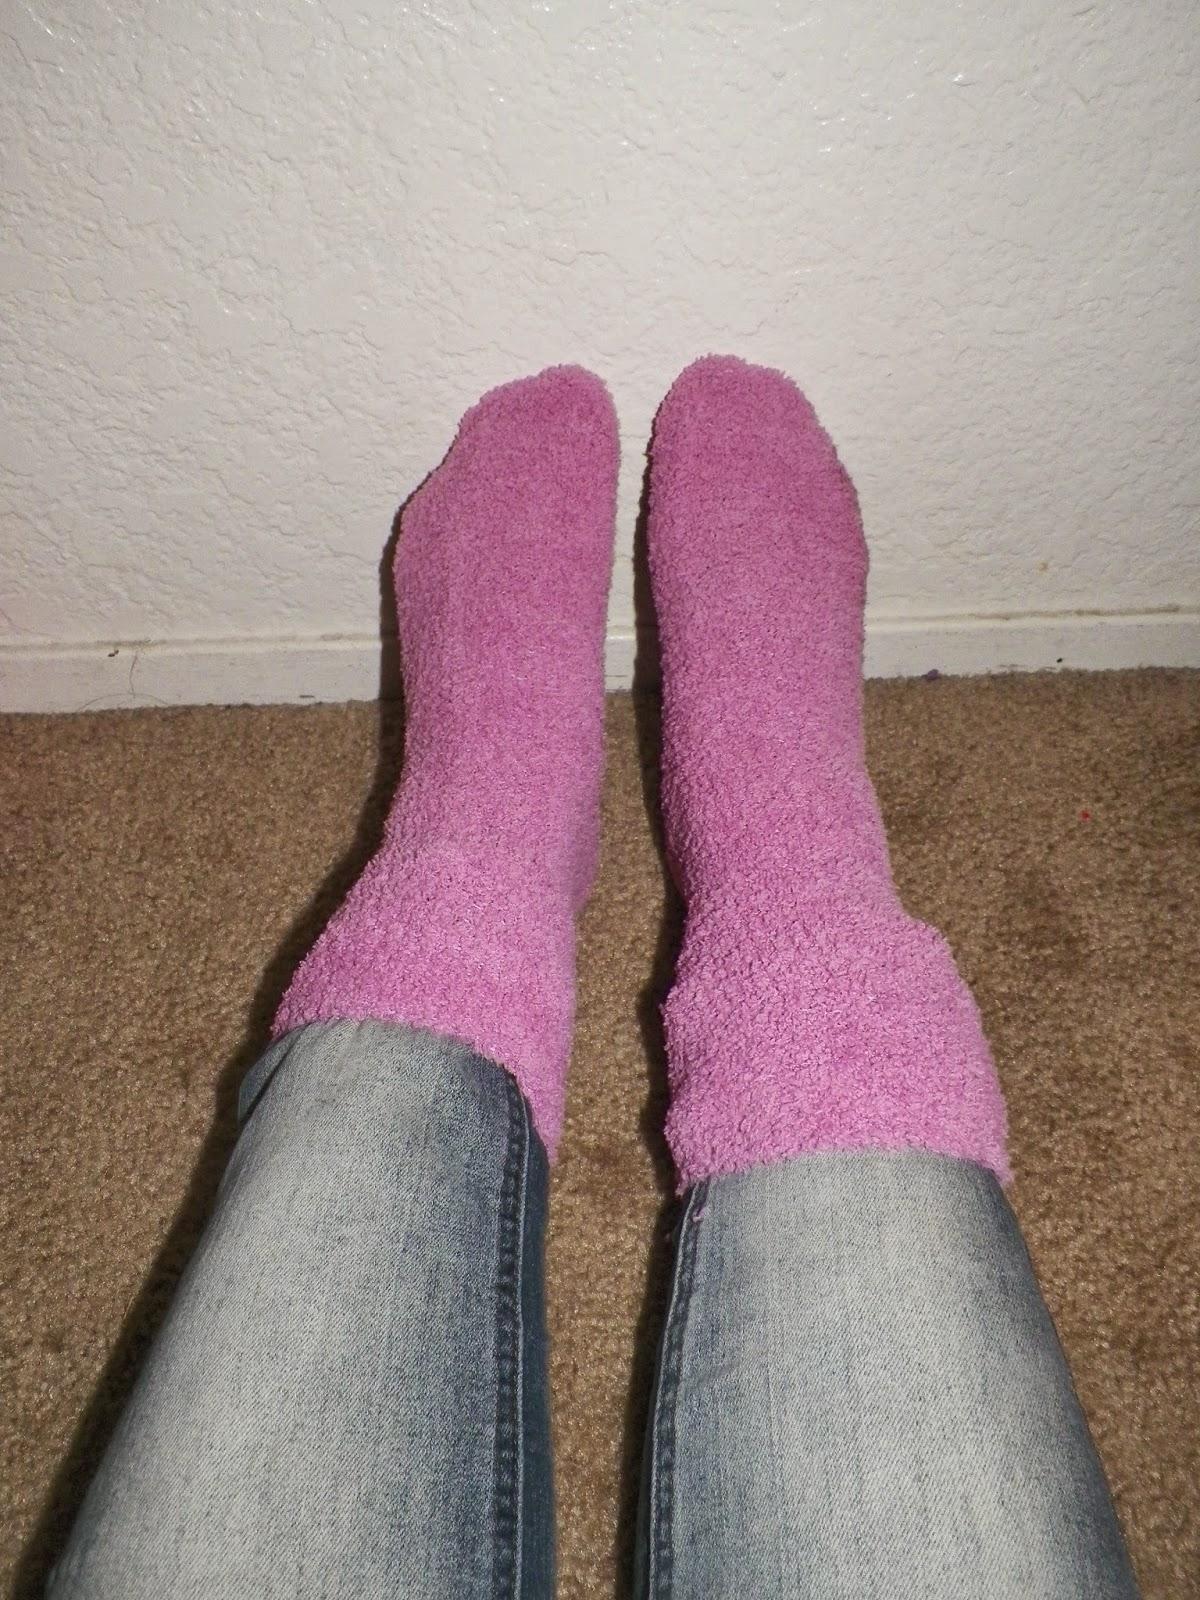 Pembrook_Non_Skid_Socks.jpg